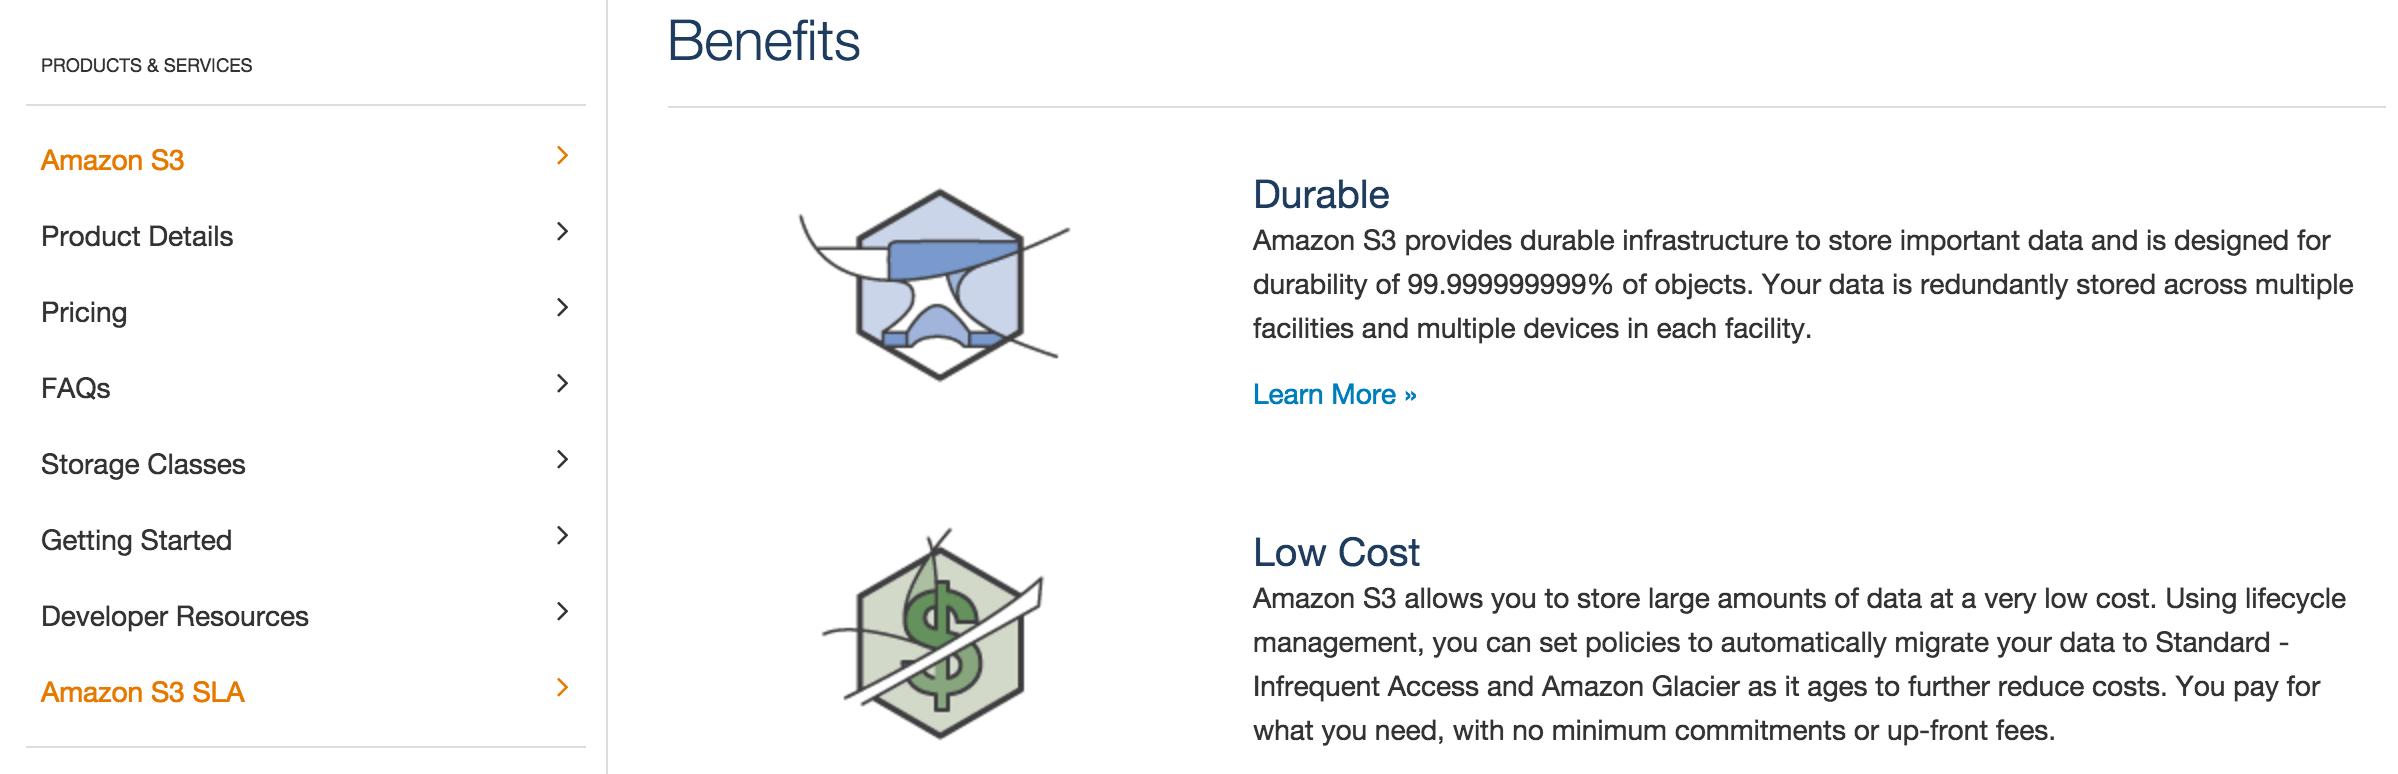 The Amazon S3 homepage.